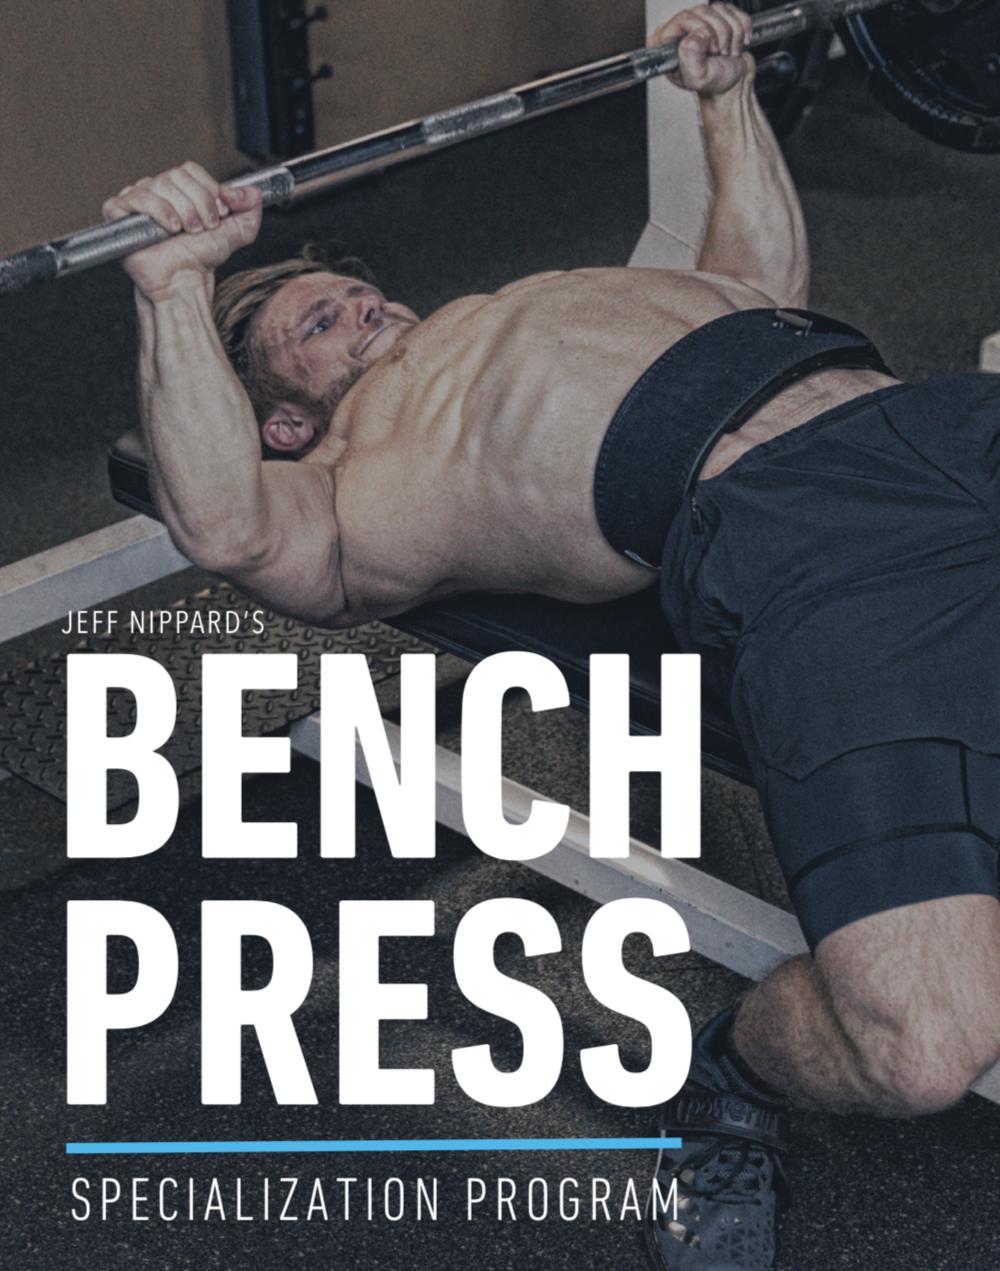 BENCH PRESS PROGRAM COVER